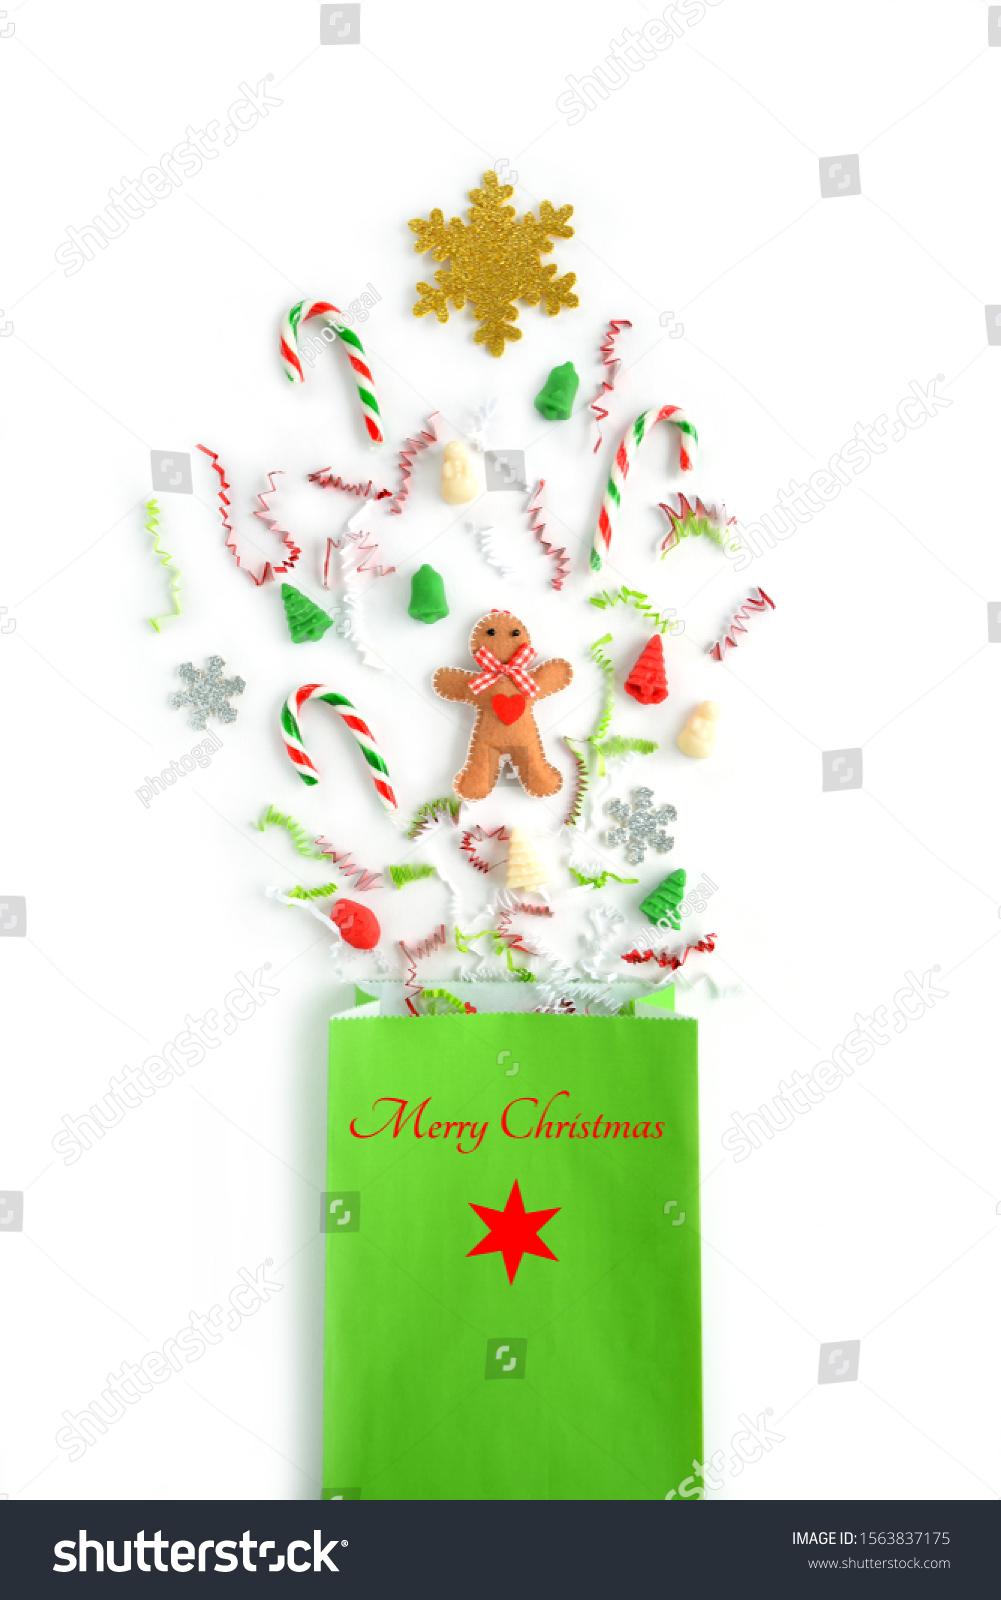 stock-photo-a-variety-of-christmas-objec